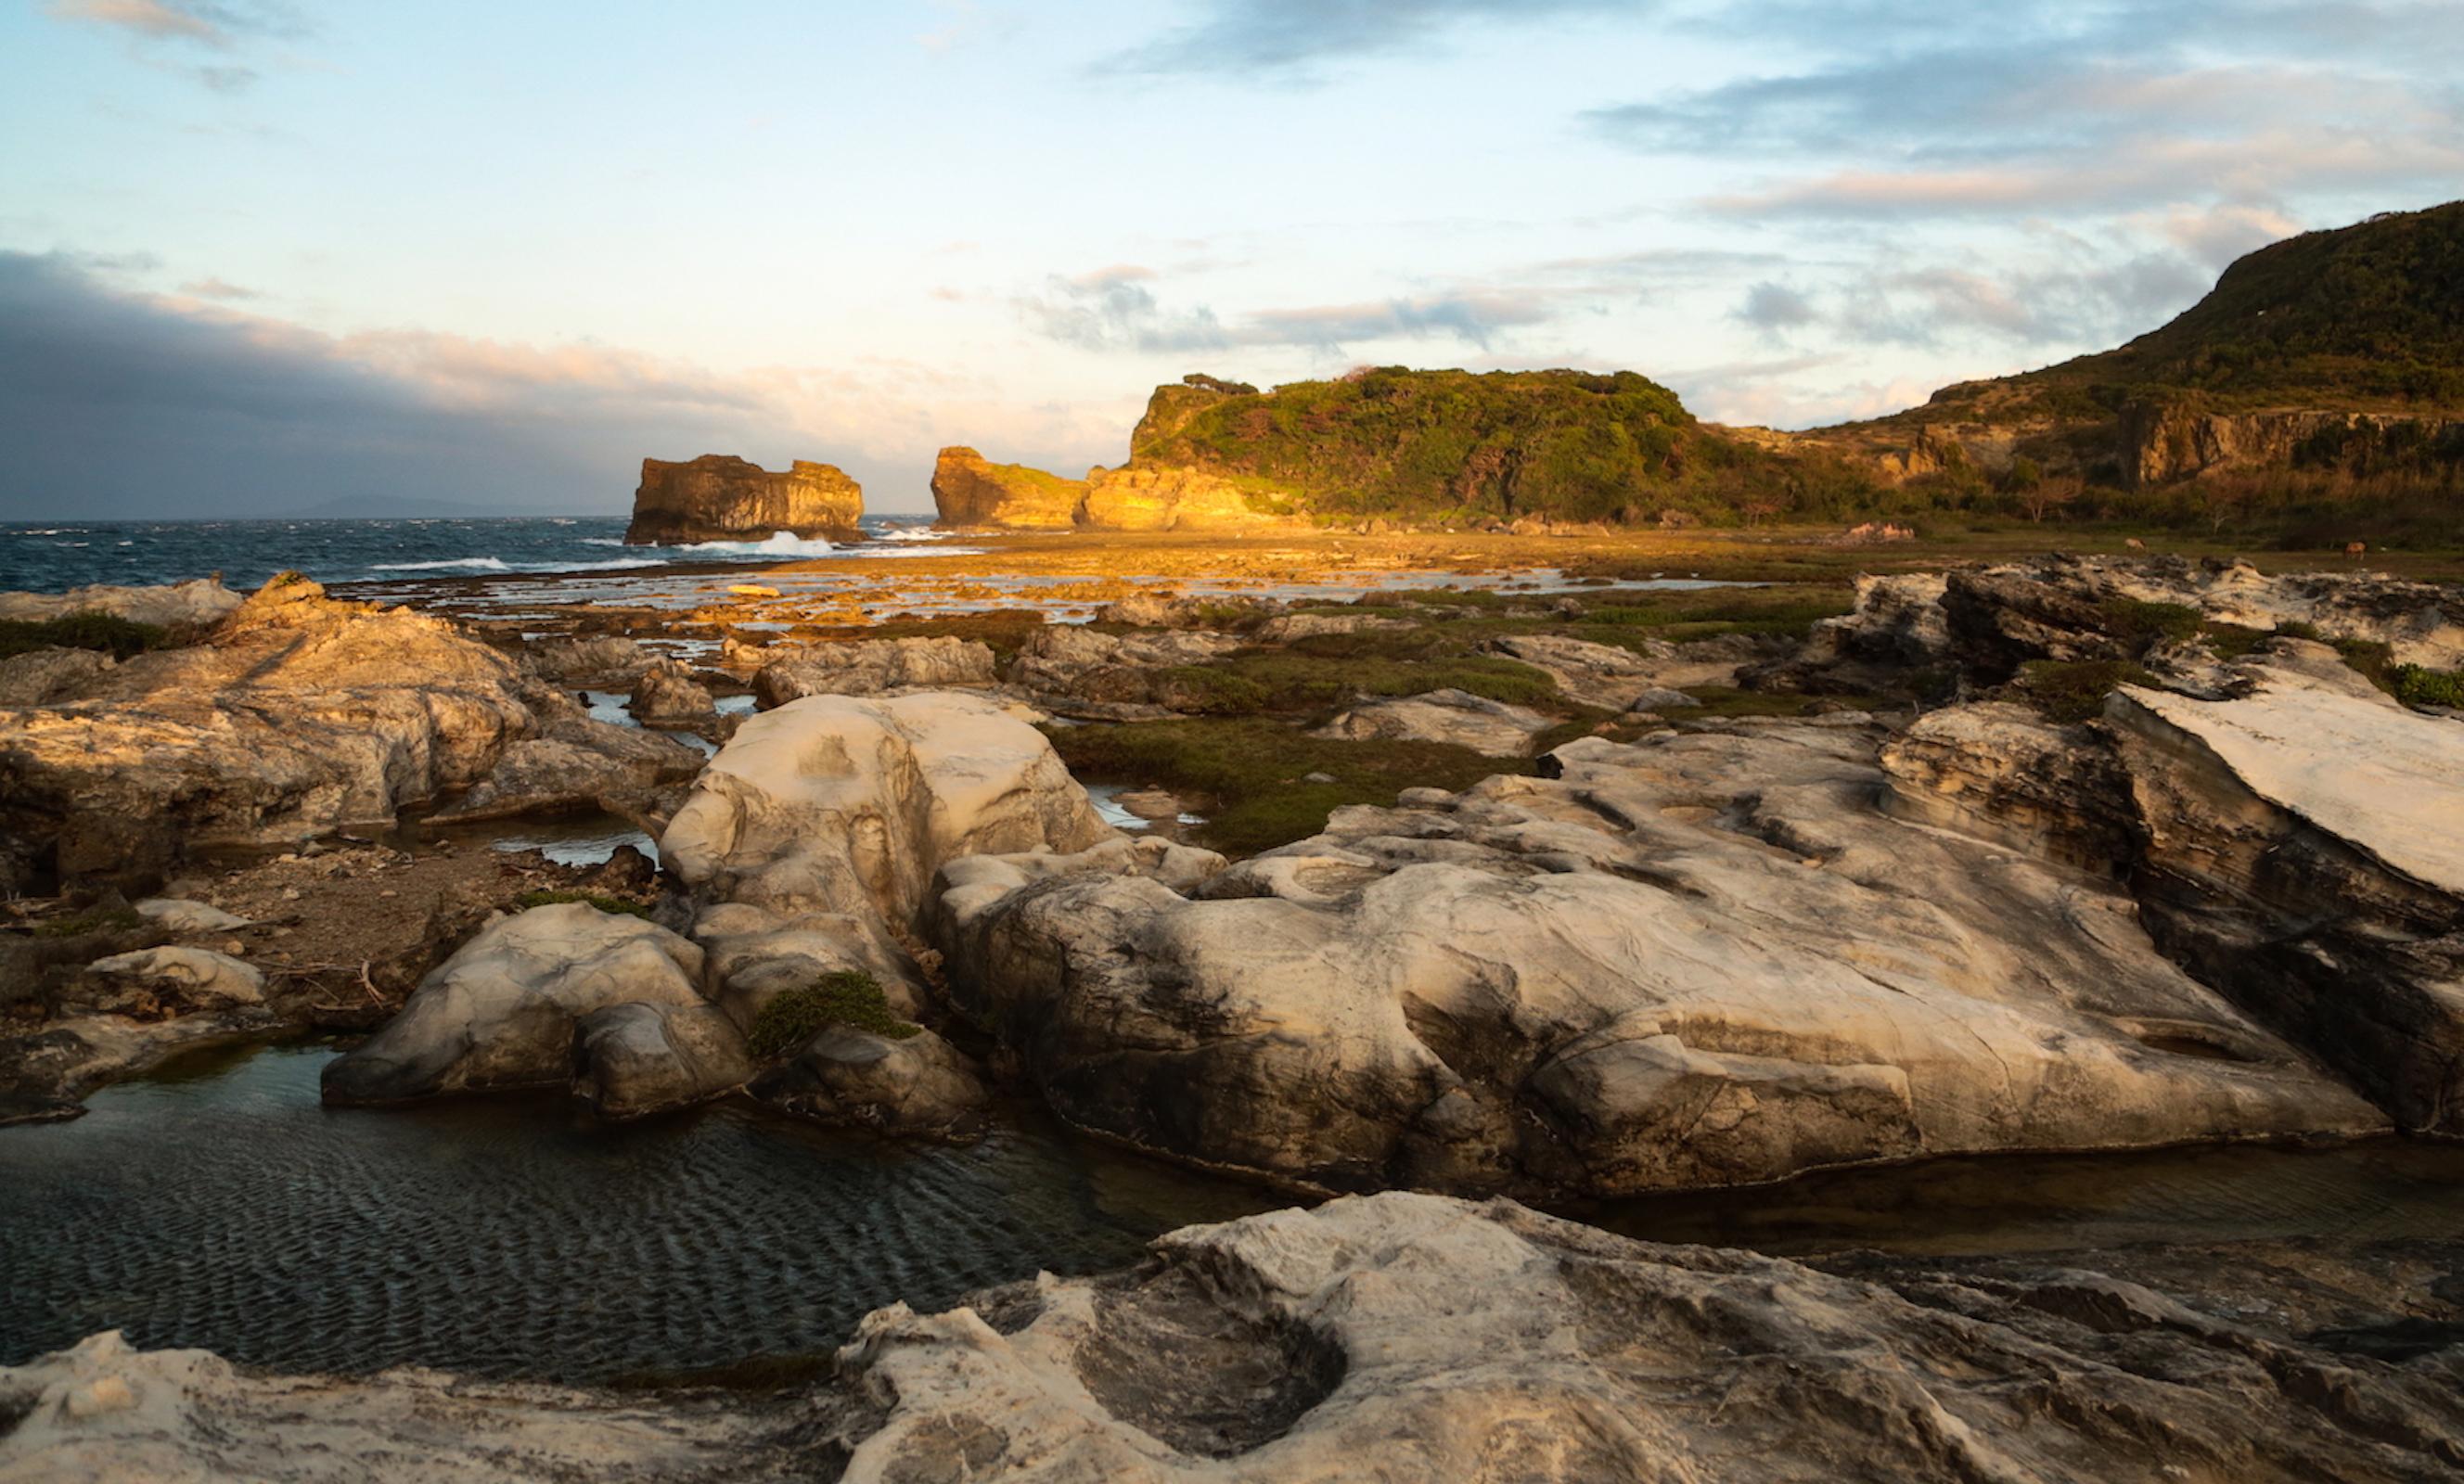 Kapurpurawan Rock Formation during sunrise